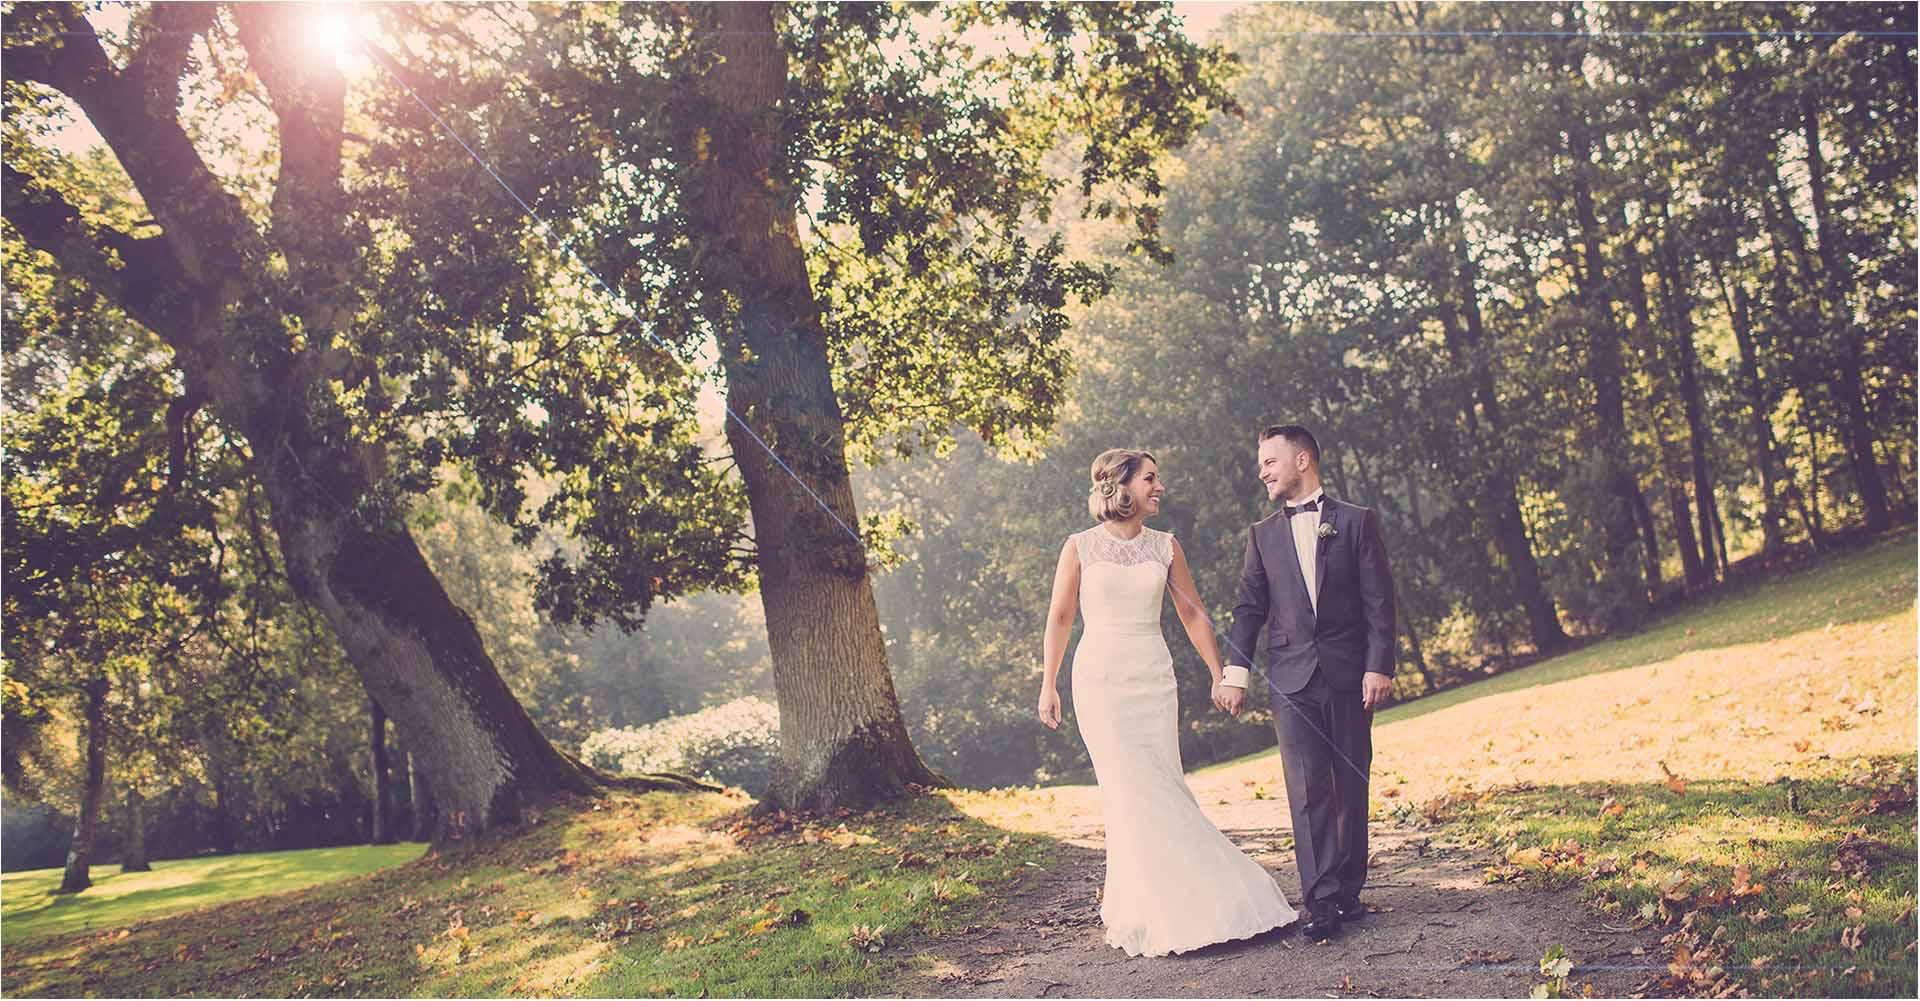 Fotograf til bryllupper (@rossthebosss) Cover Image